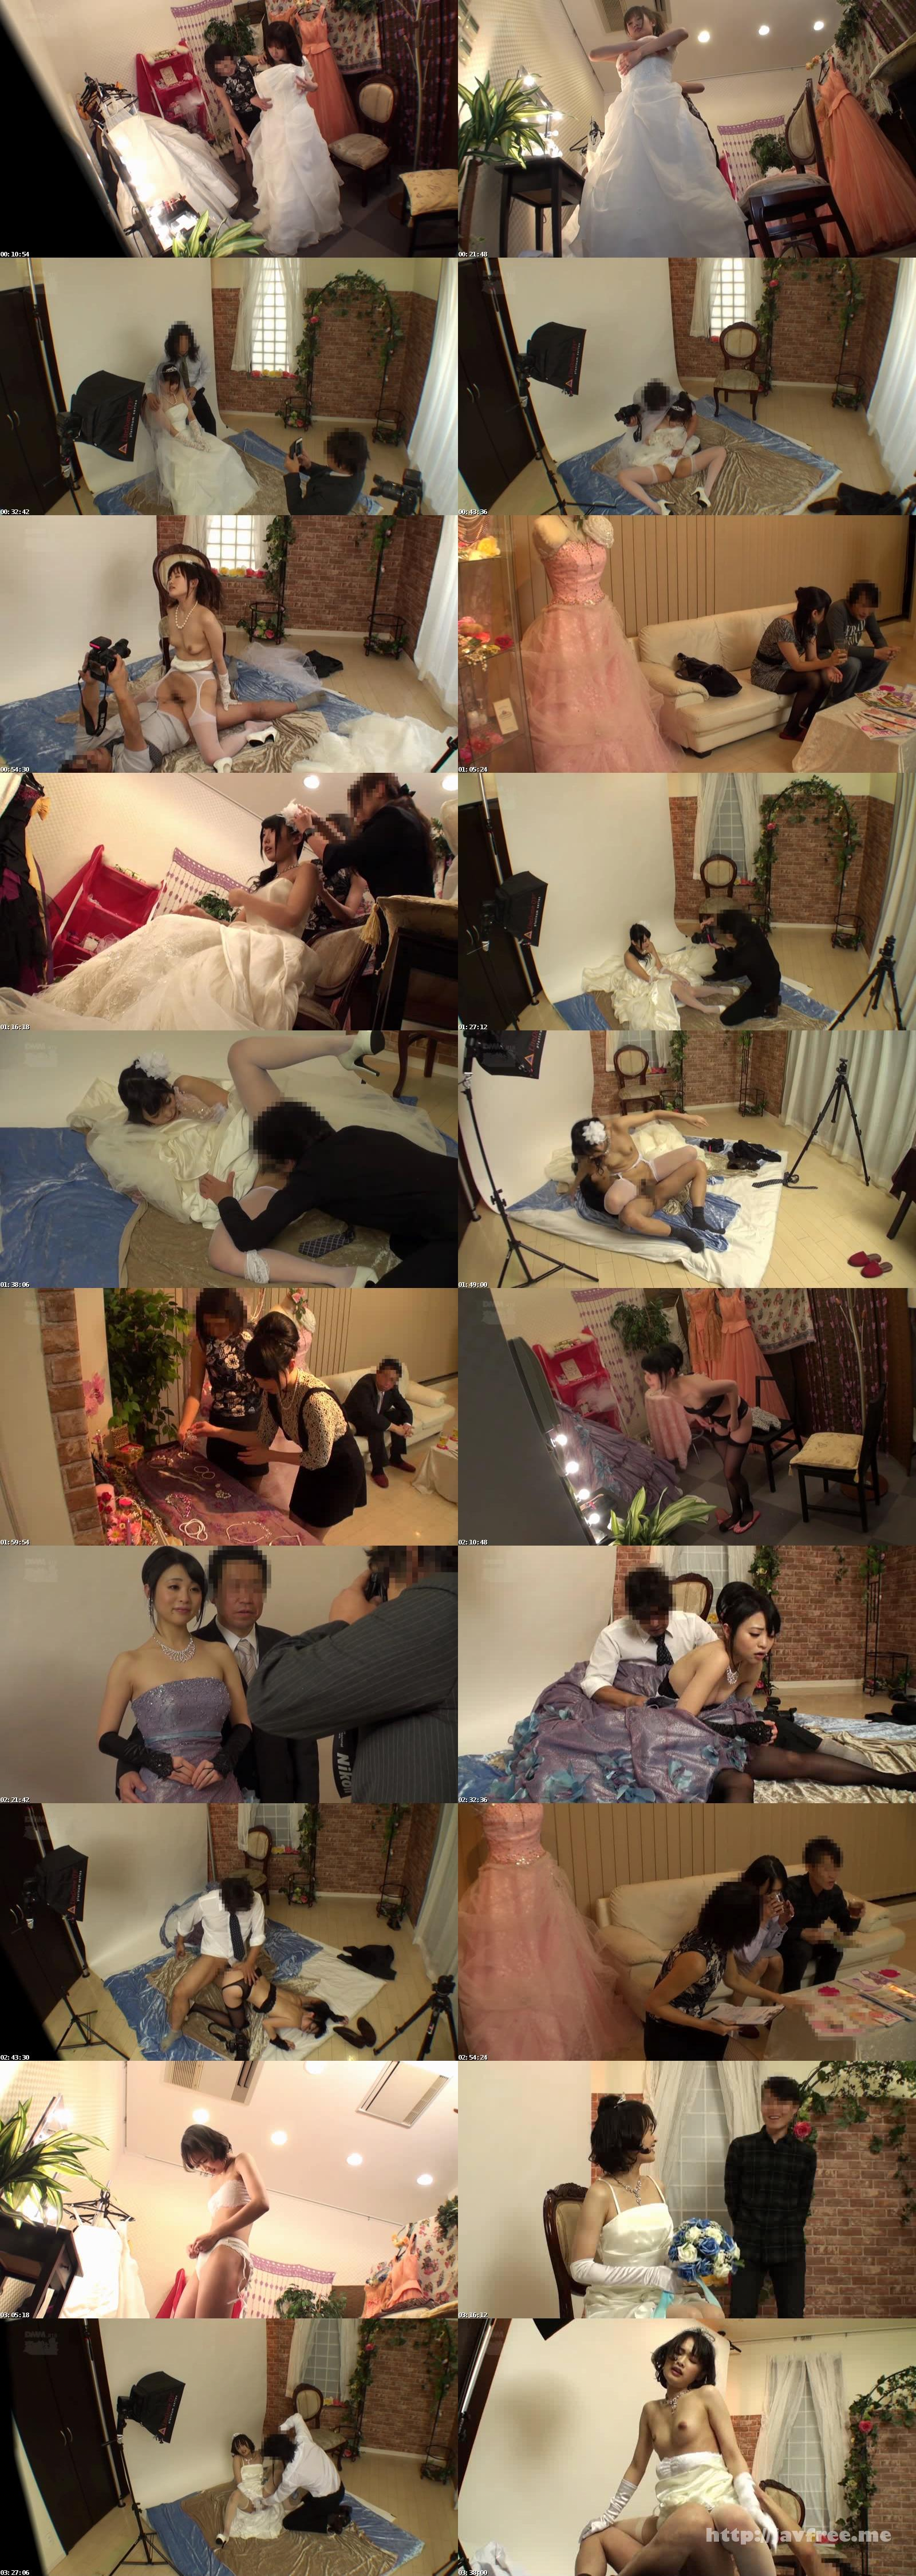 [CLUB 181] 結婚式前に写真スタジオで撮影するカップルの新郎が待つ隣で新婦を寝取りレイプ4 CLUB